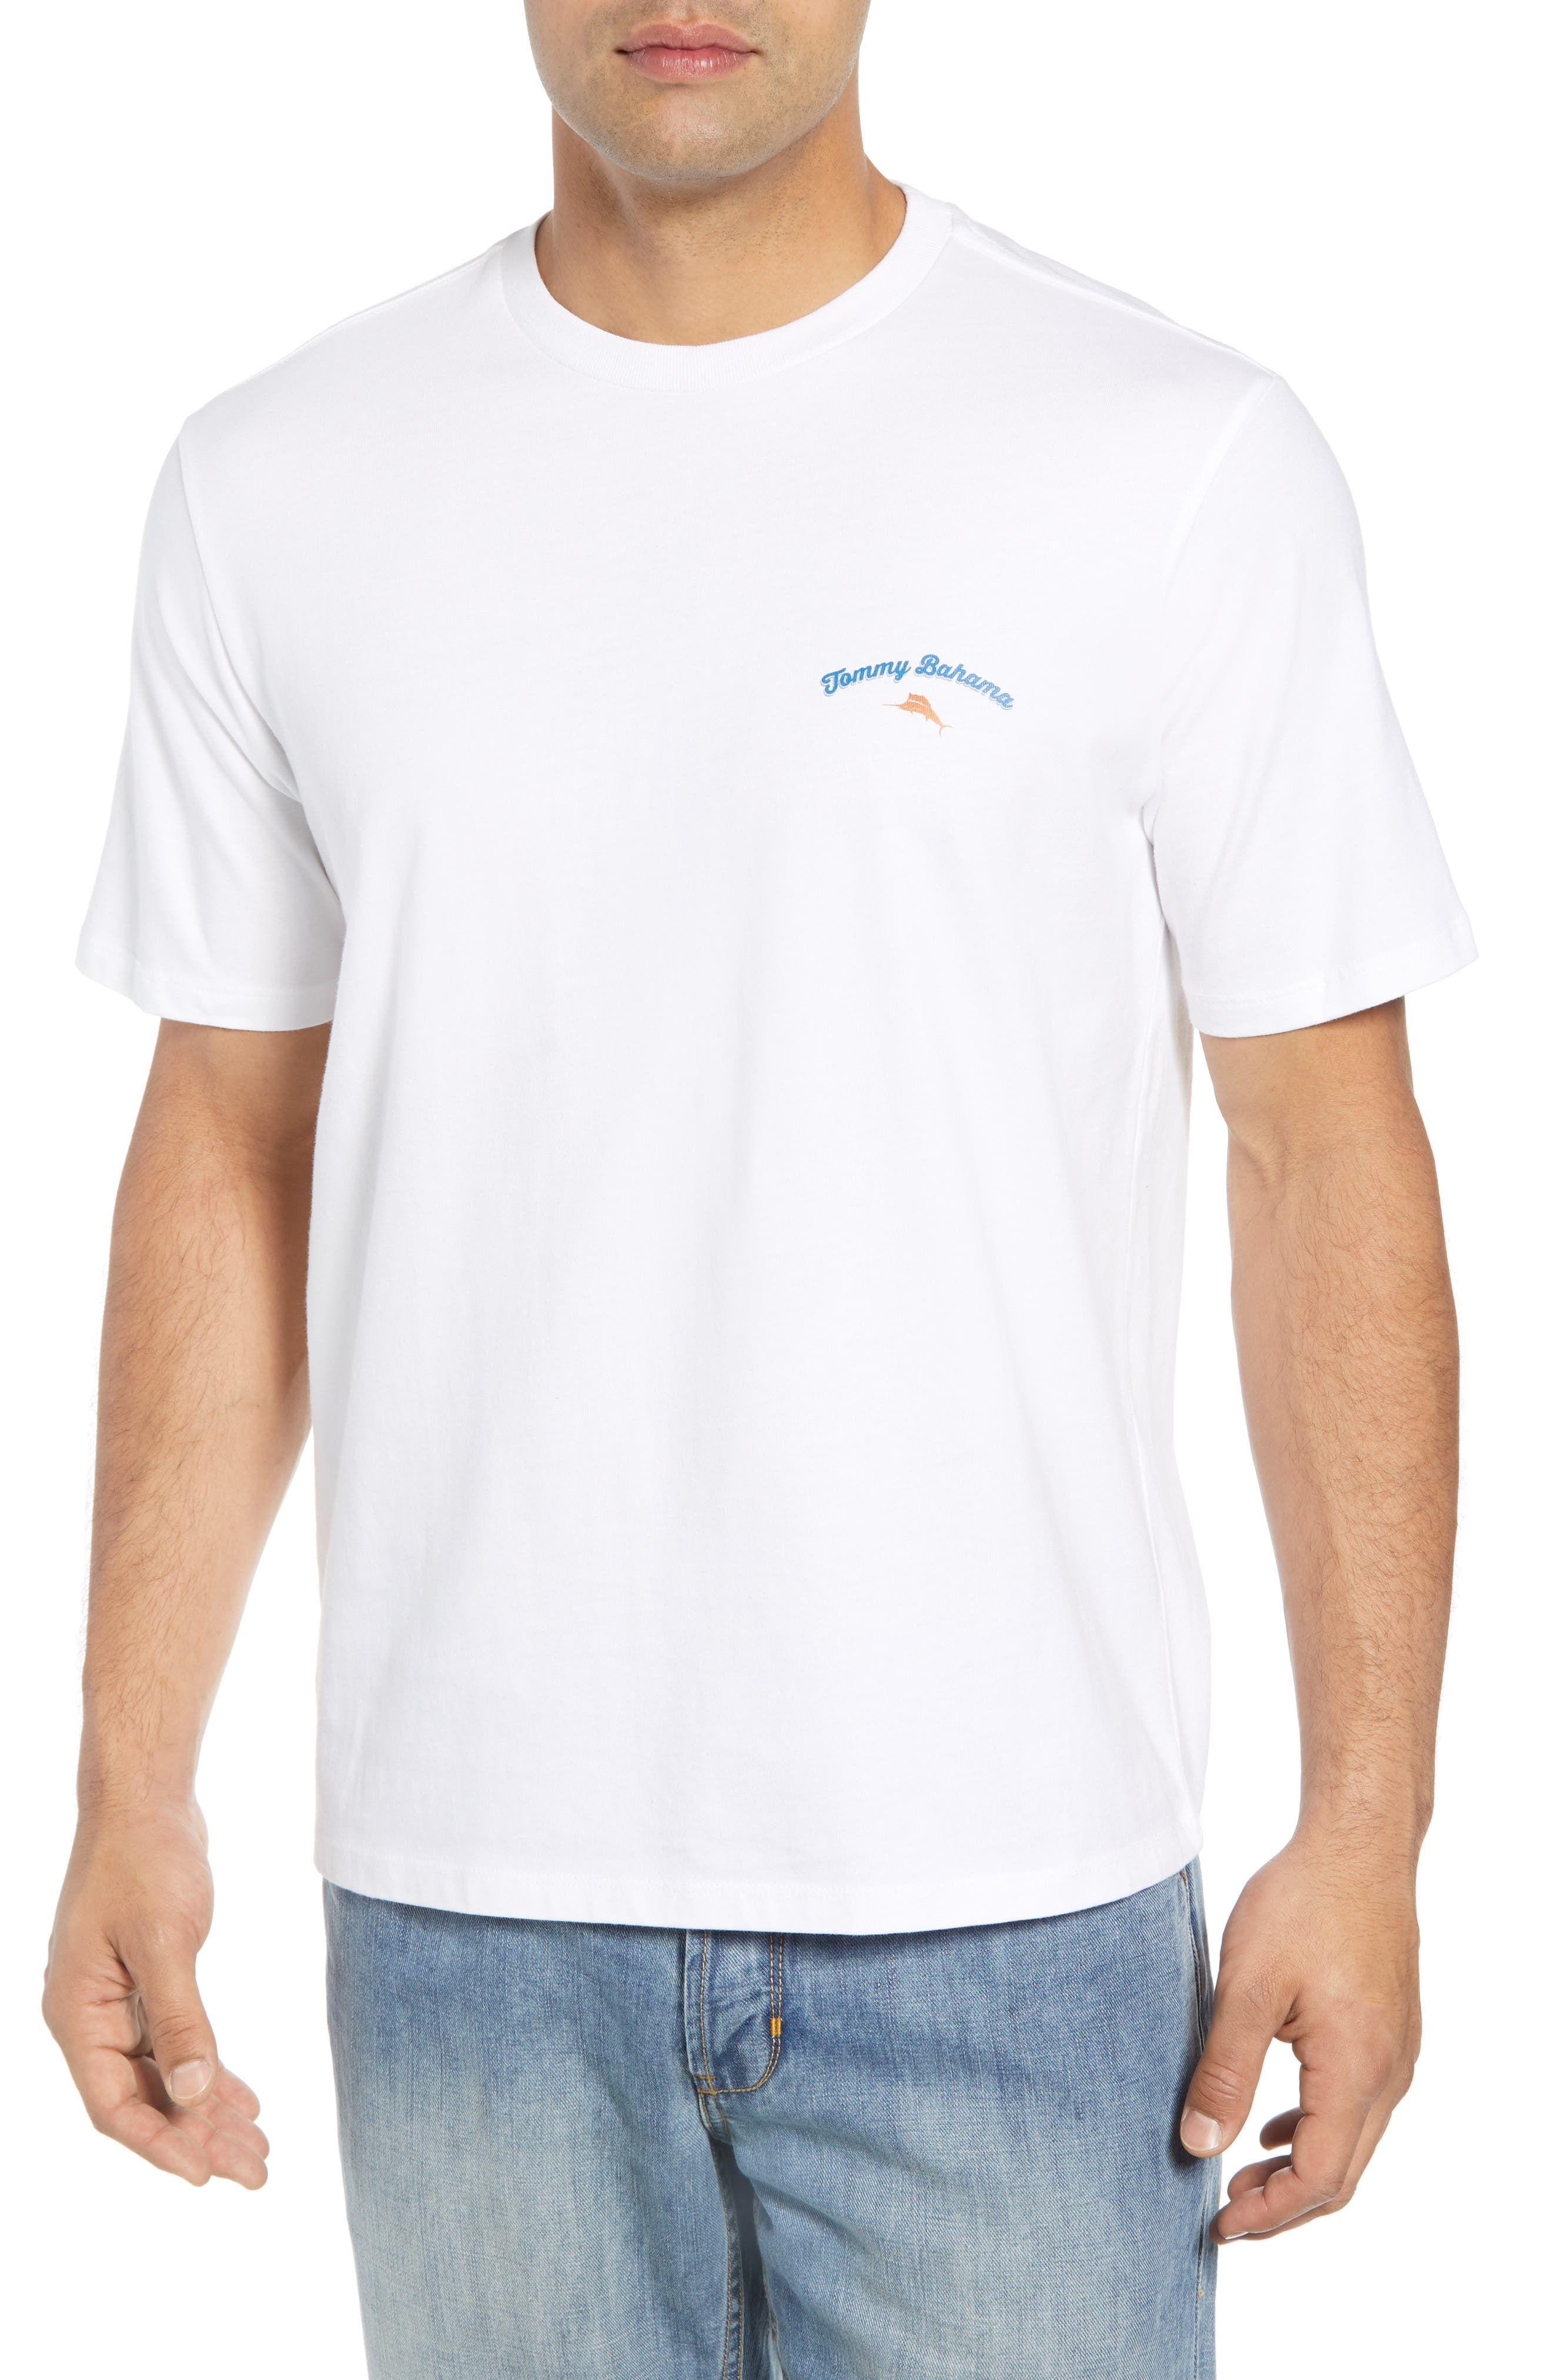 It's Glow Time T-Shirt,                             Main thumbnail 1, color,                             WHITE